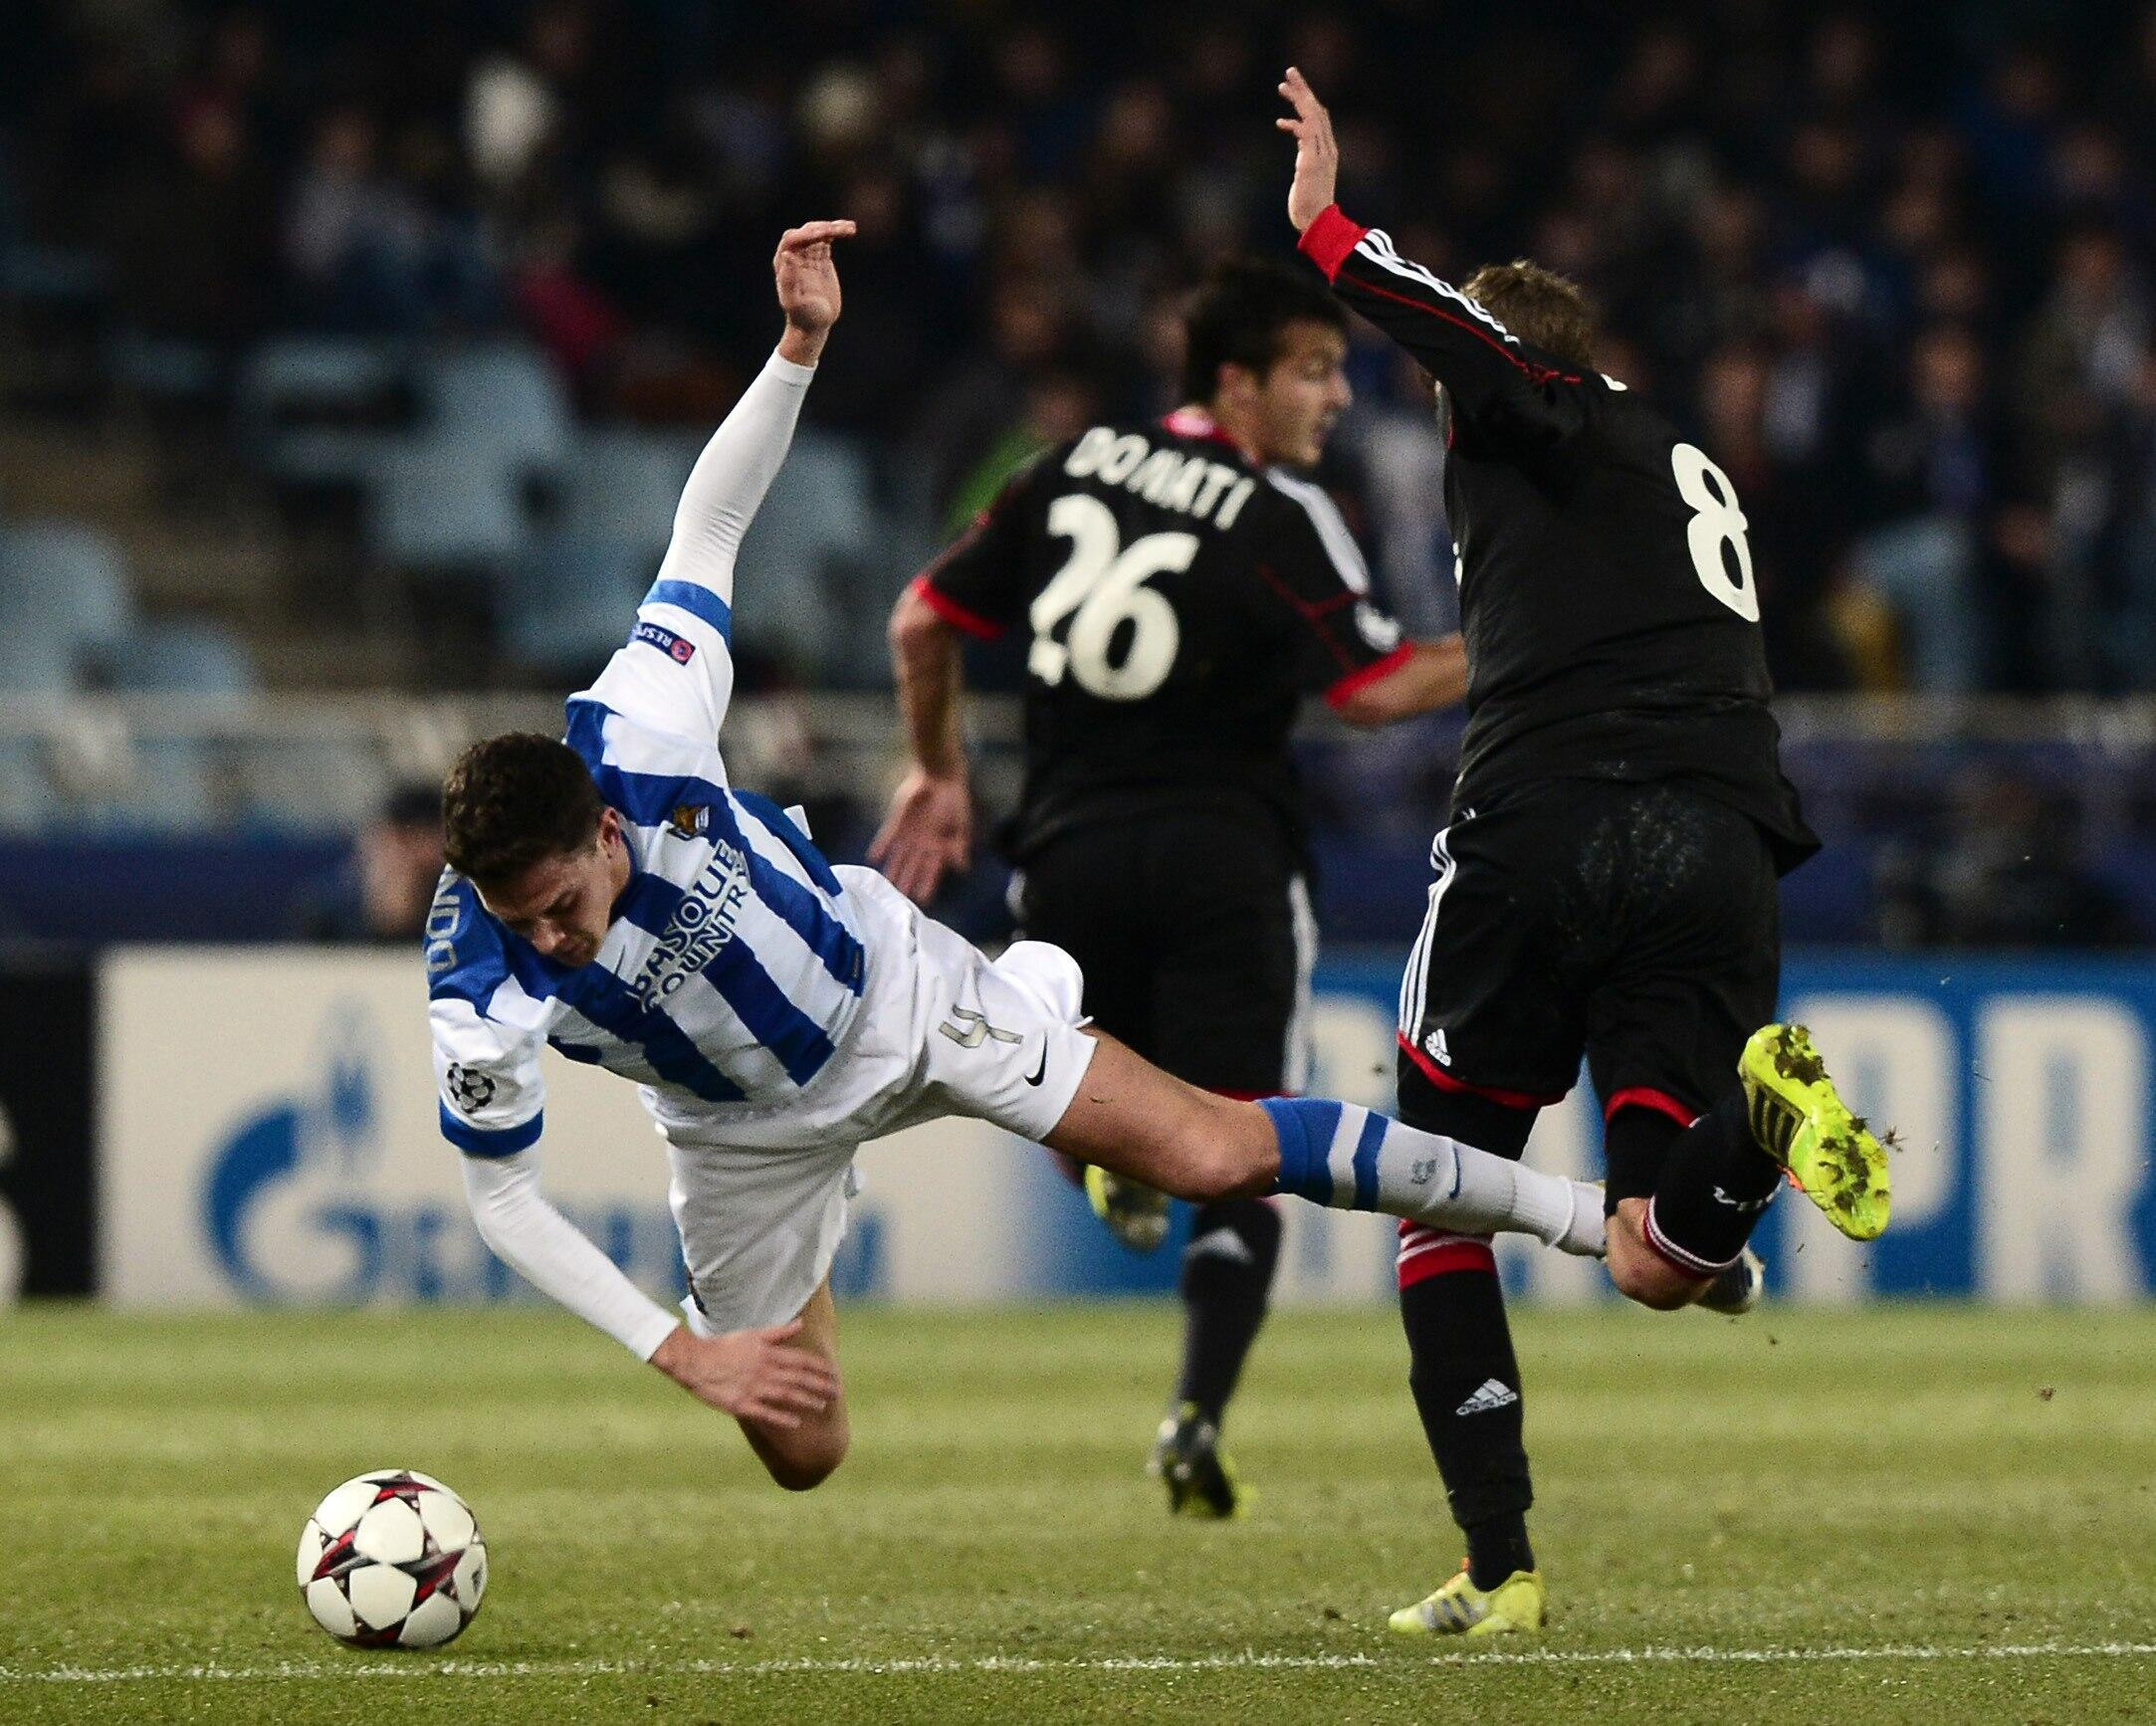 O Bayer Leverkusen garantiu sua vaga nas oitavas da 'Champions'.